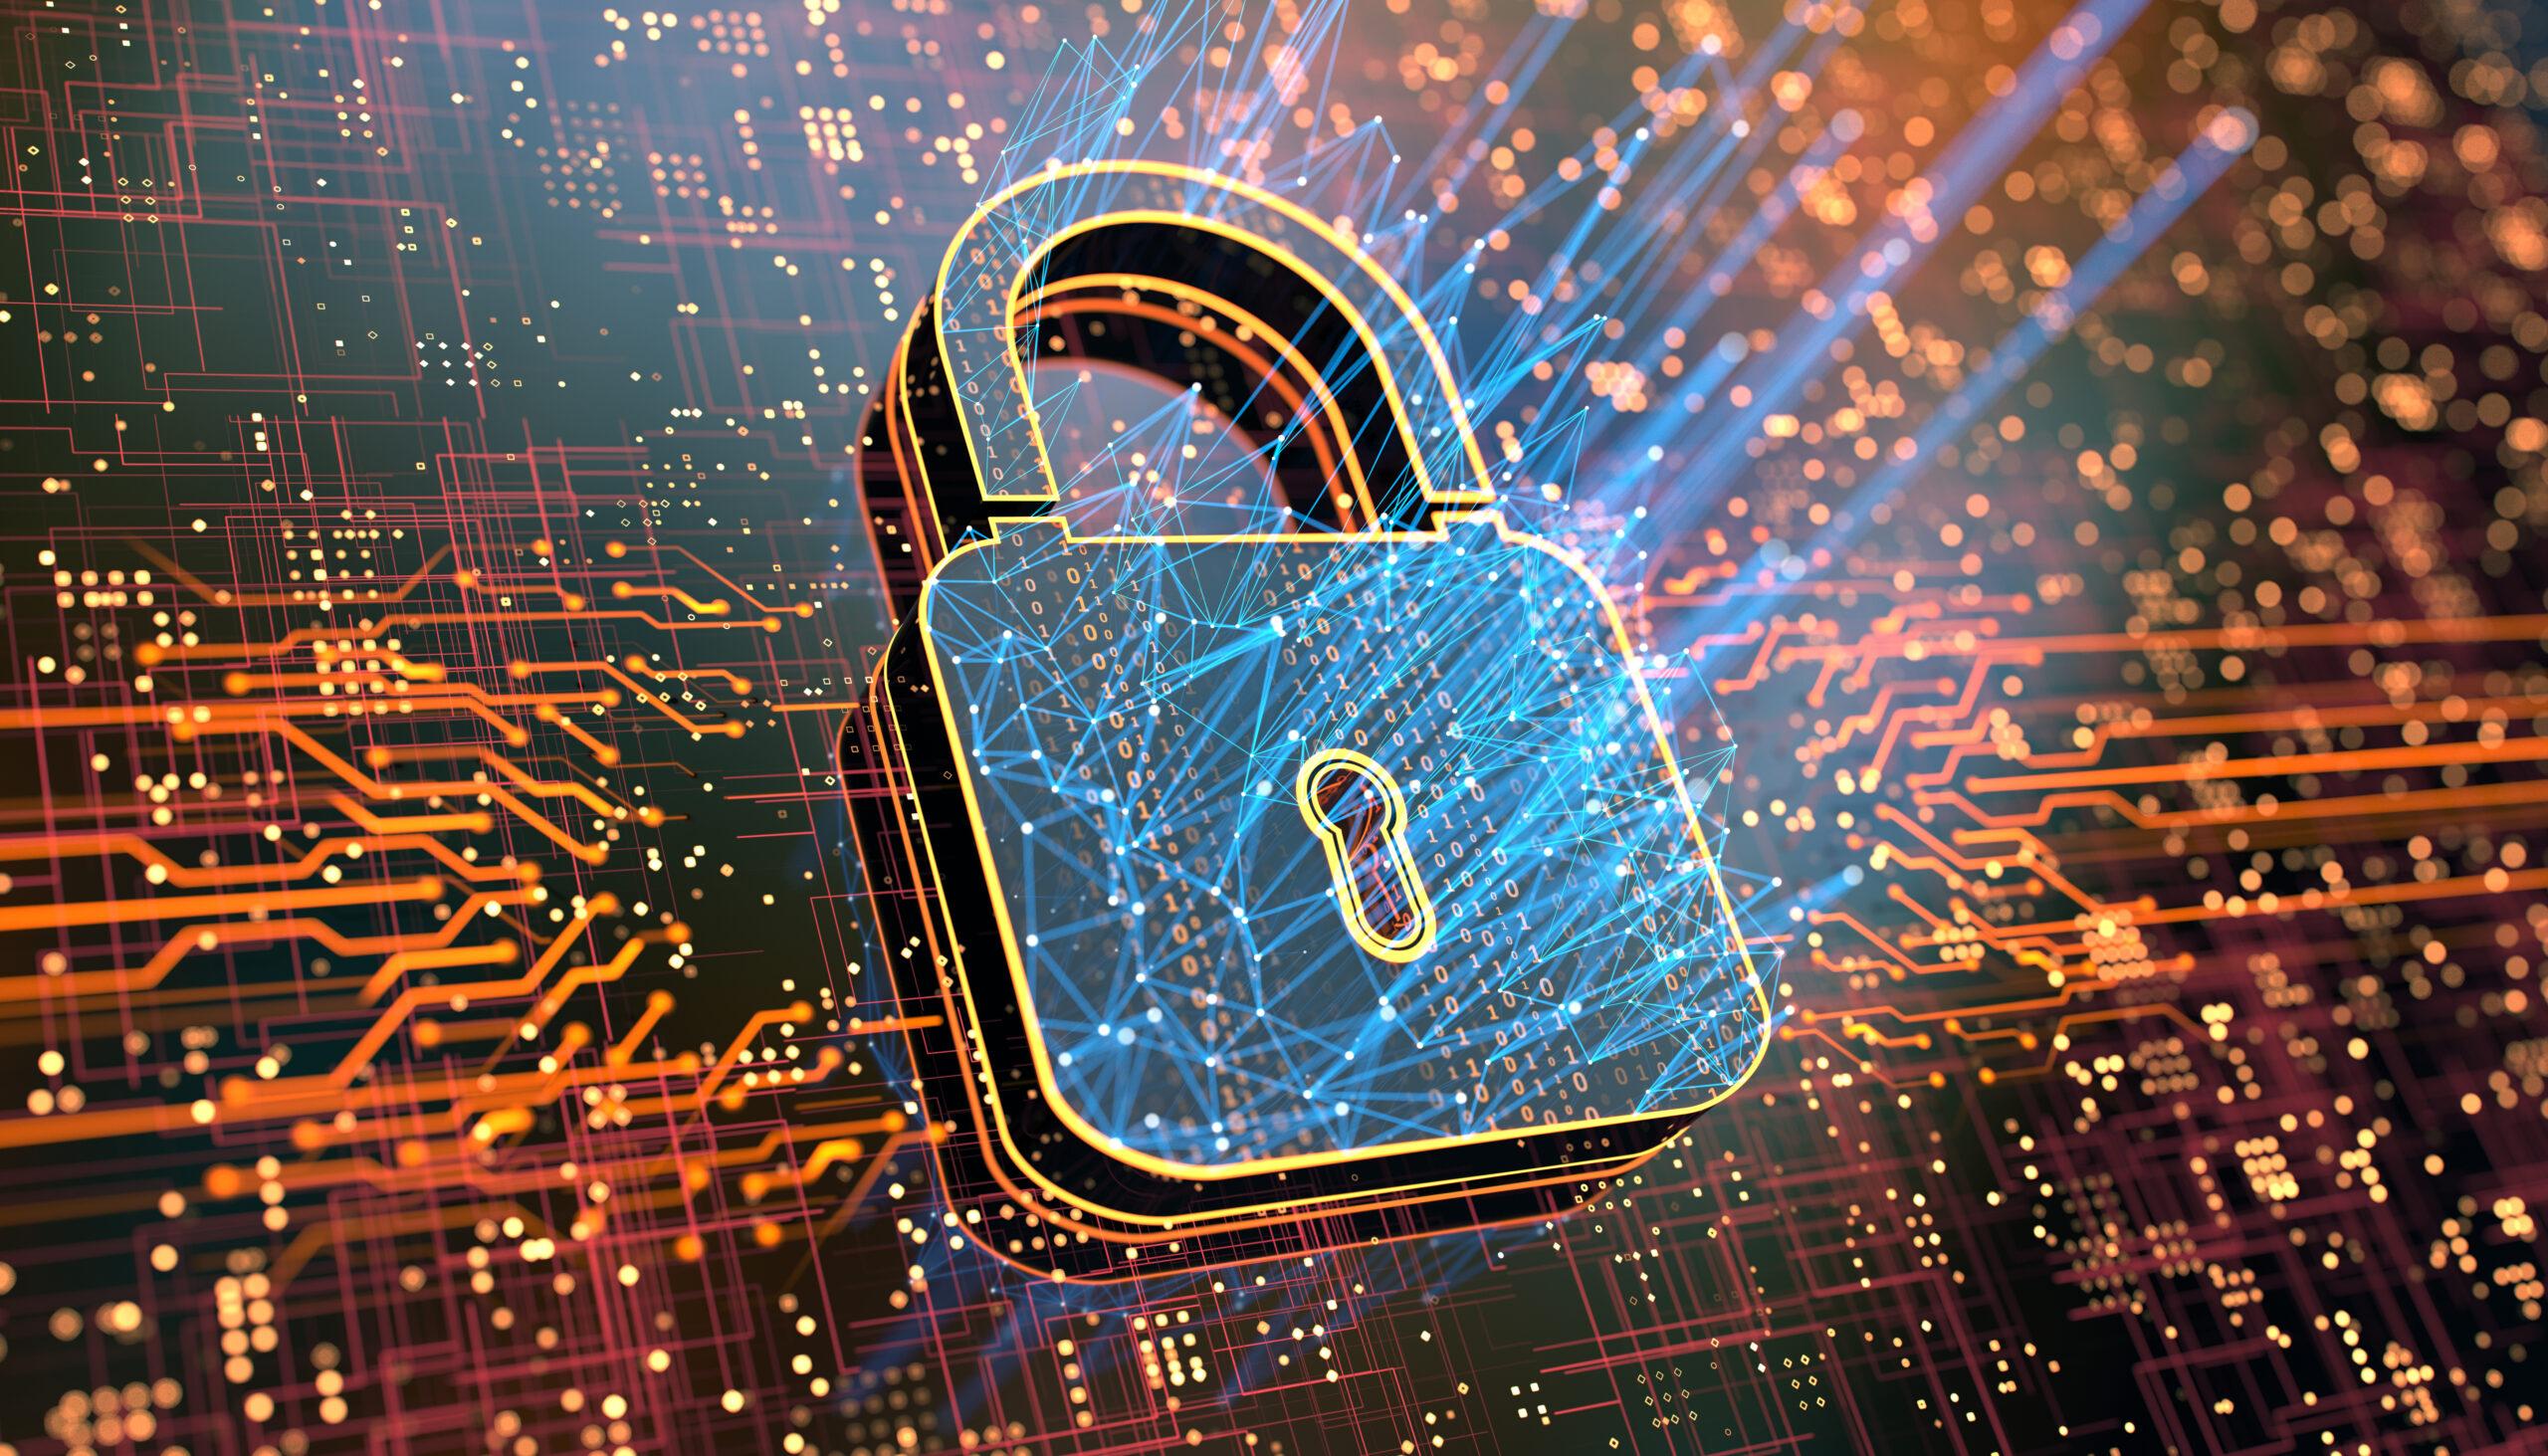 Cybersecurity risks a growing ESG concern